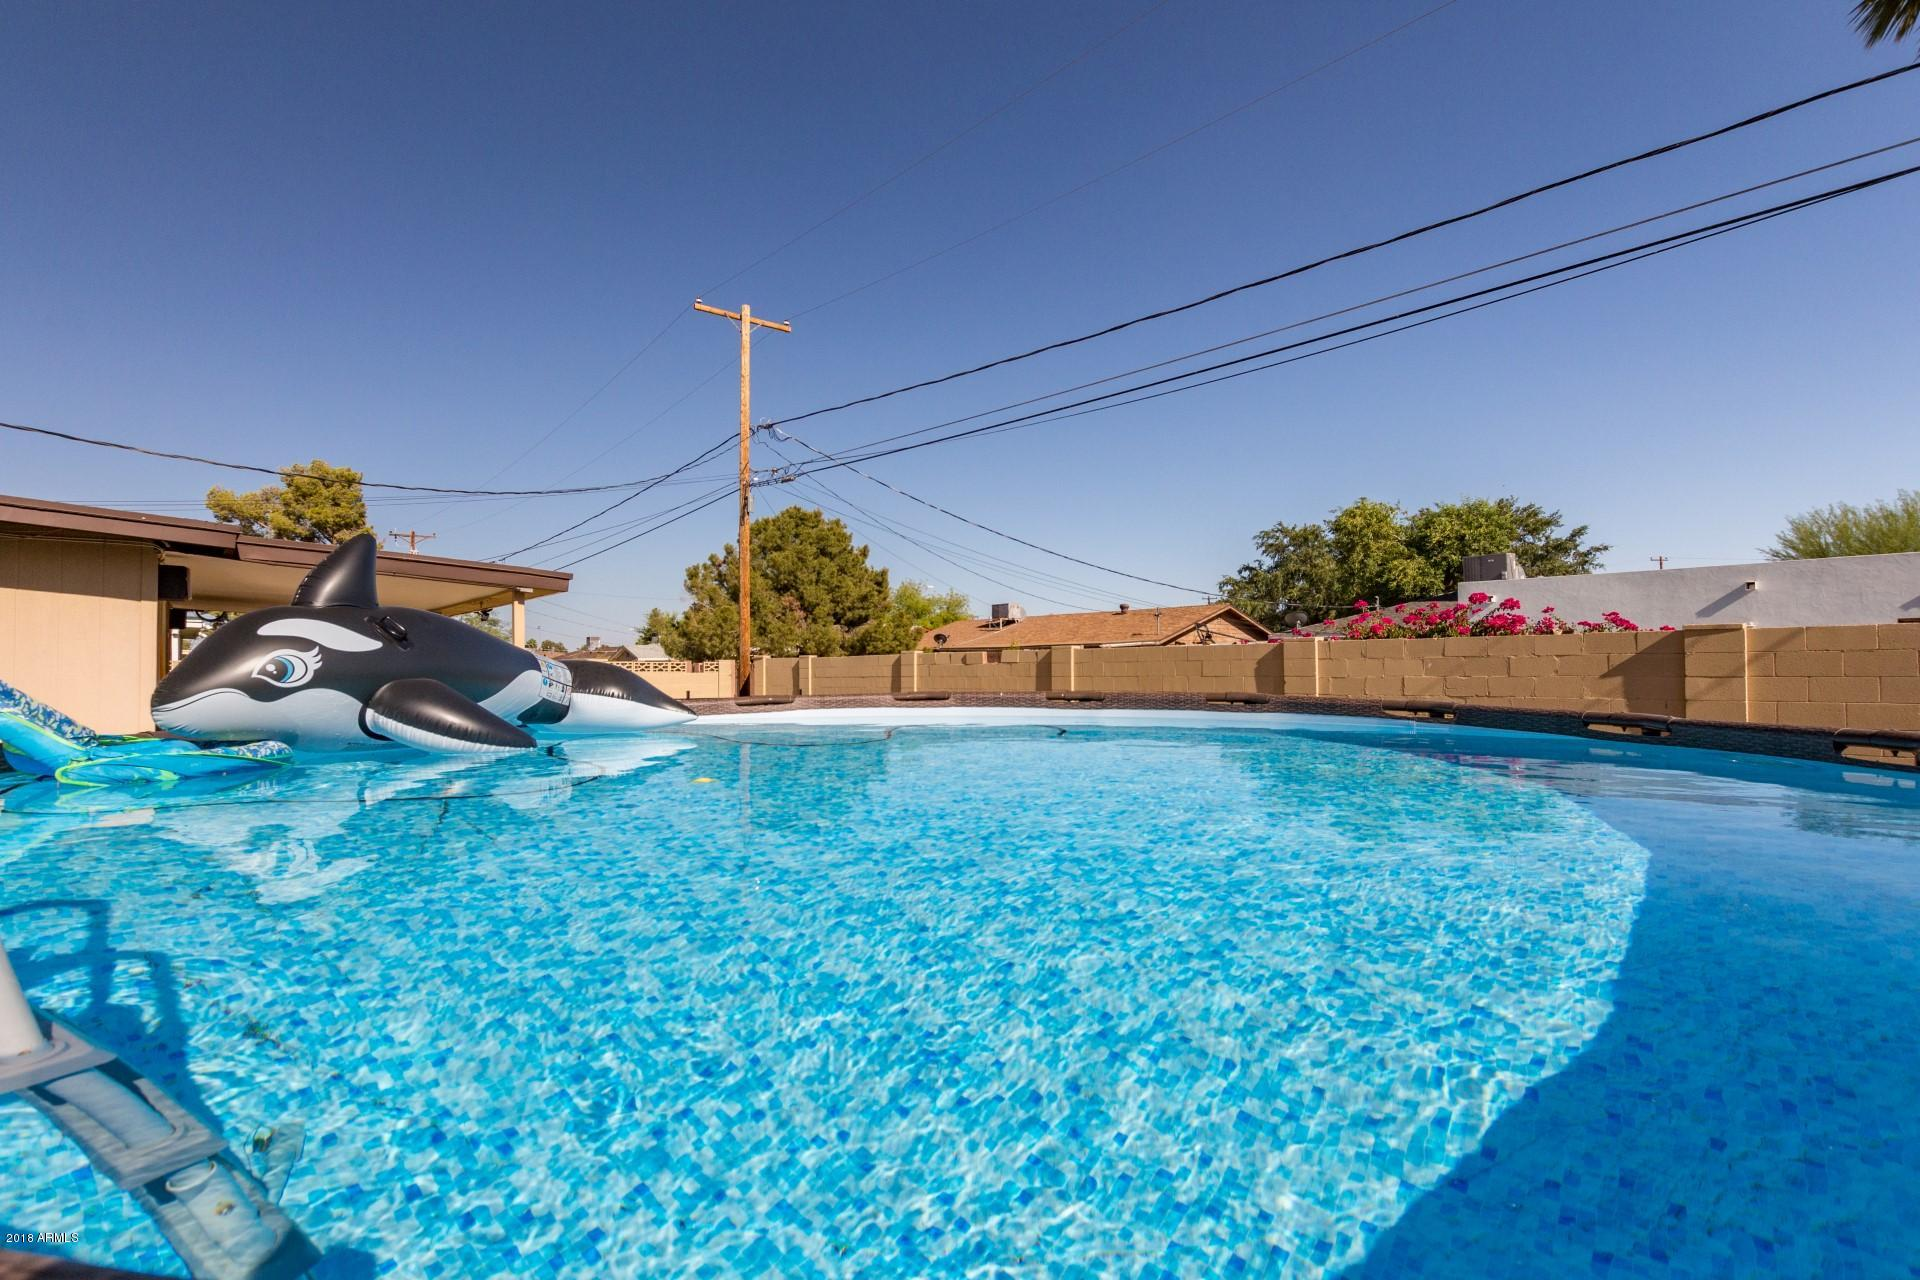 7421 E HOLLY Street, Scottsdale, AZ 85257 (MLS# 5788039